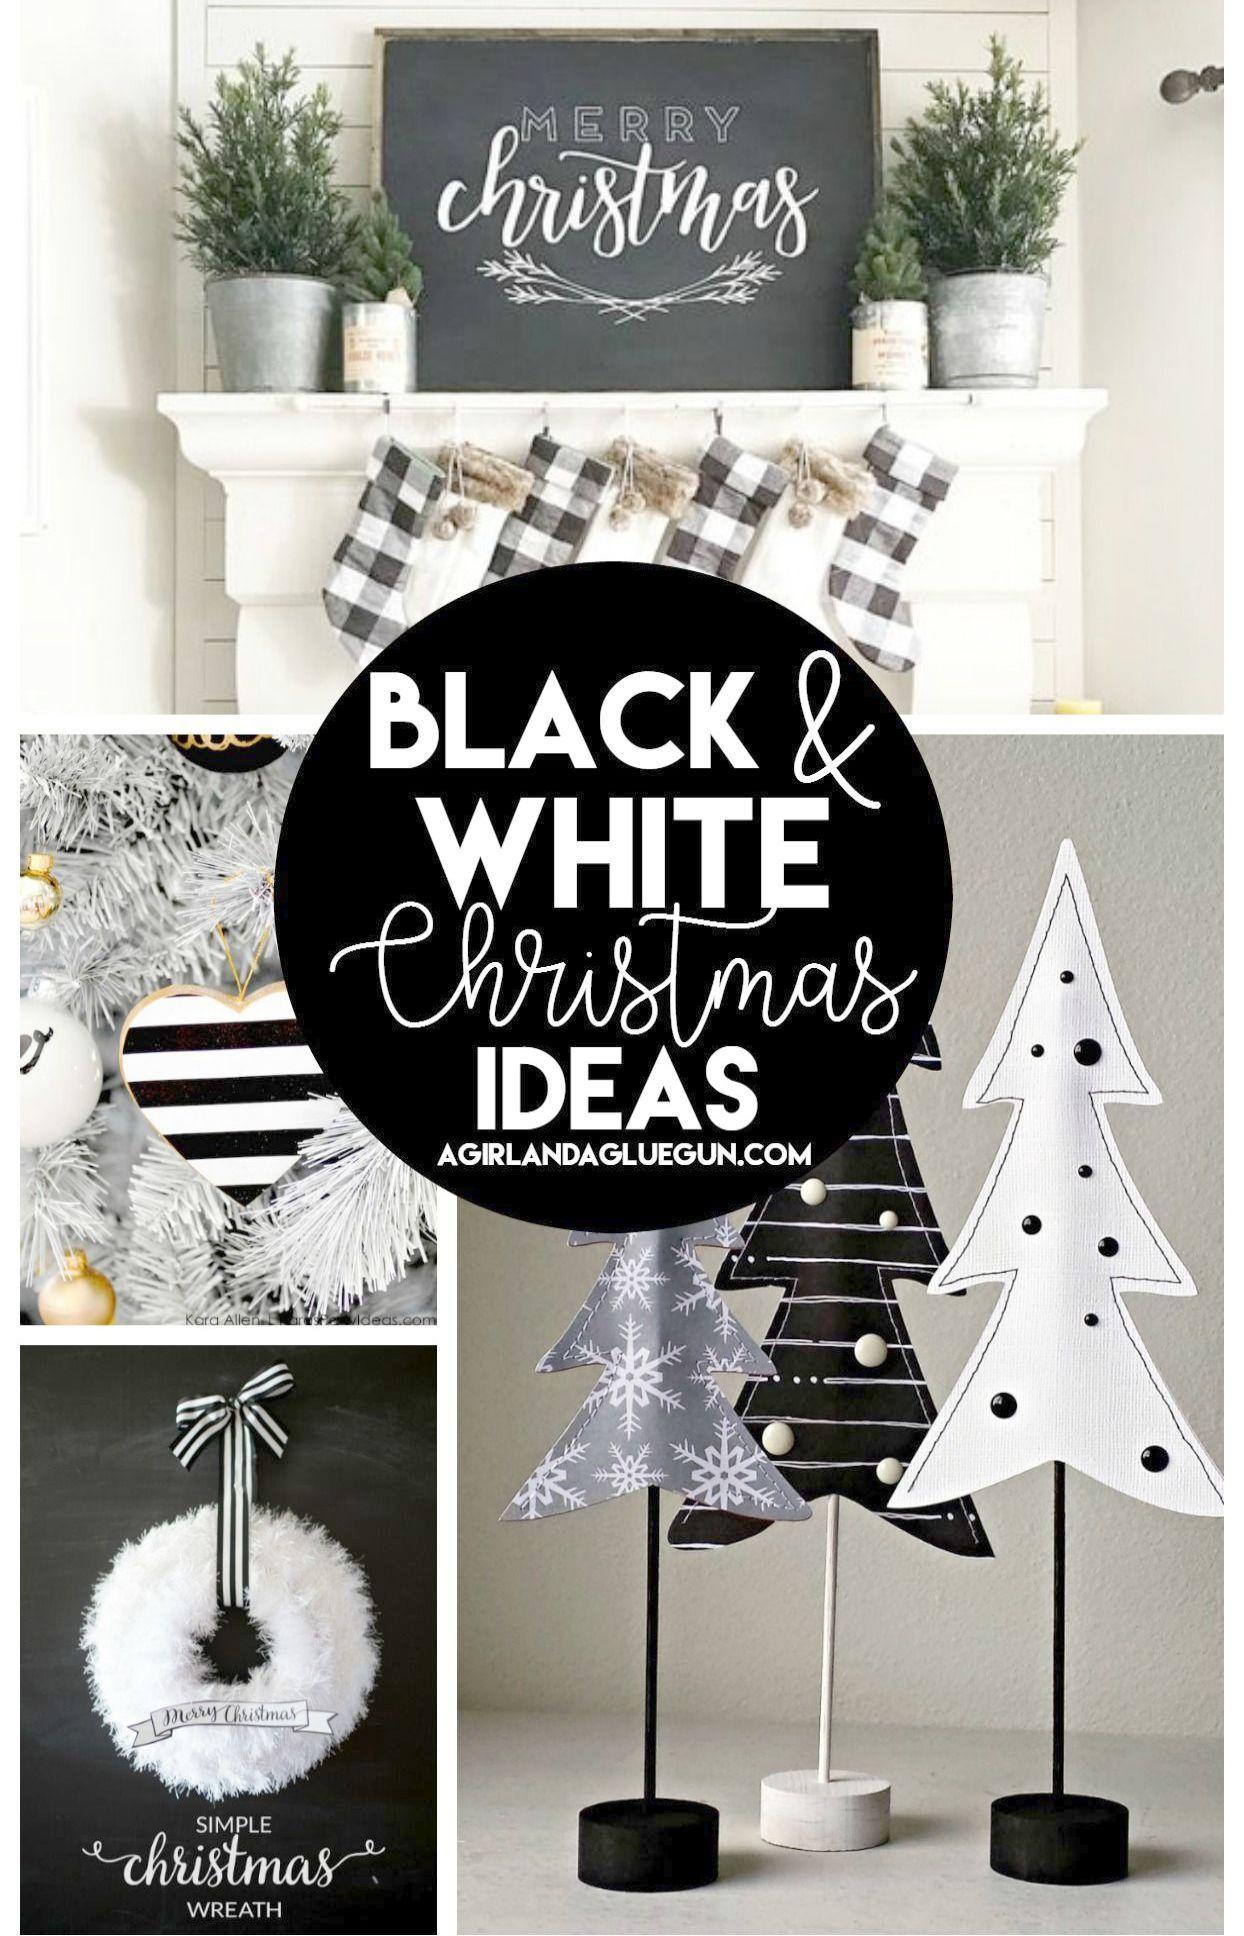 Christmas Tree Storage Melbourne Concerning Christmas Tree Skirt Latch Hook Kits Though Artificial Ch Red Christmas Decor White Christmas White Christmas Decor